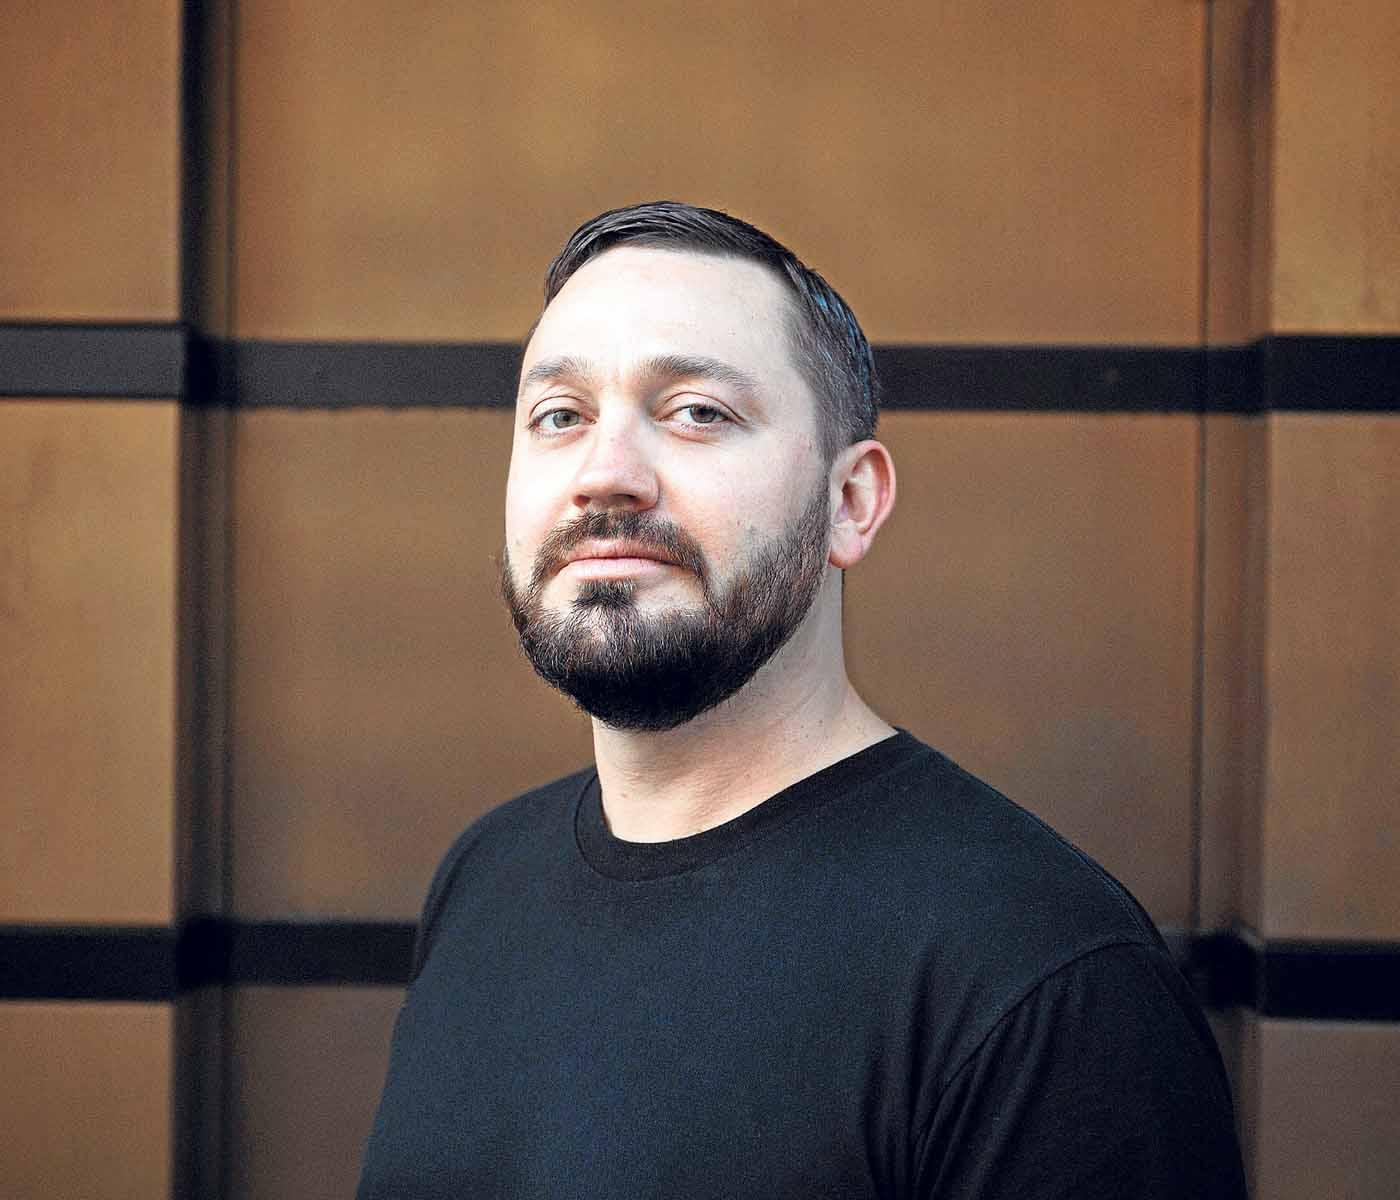 Fritz Kalkbrenner: «No escucho mucha música electrónica»